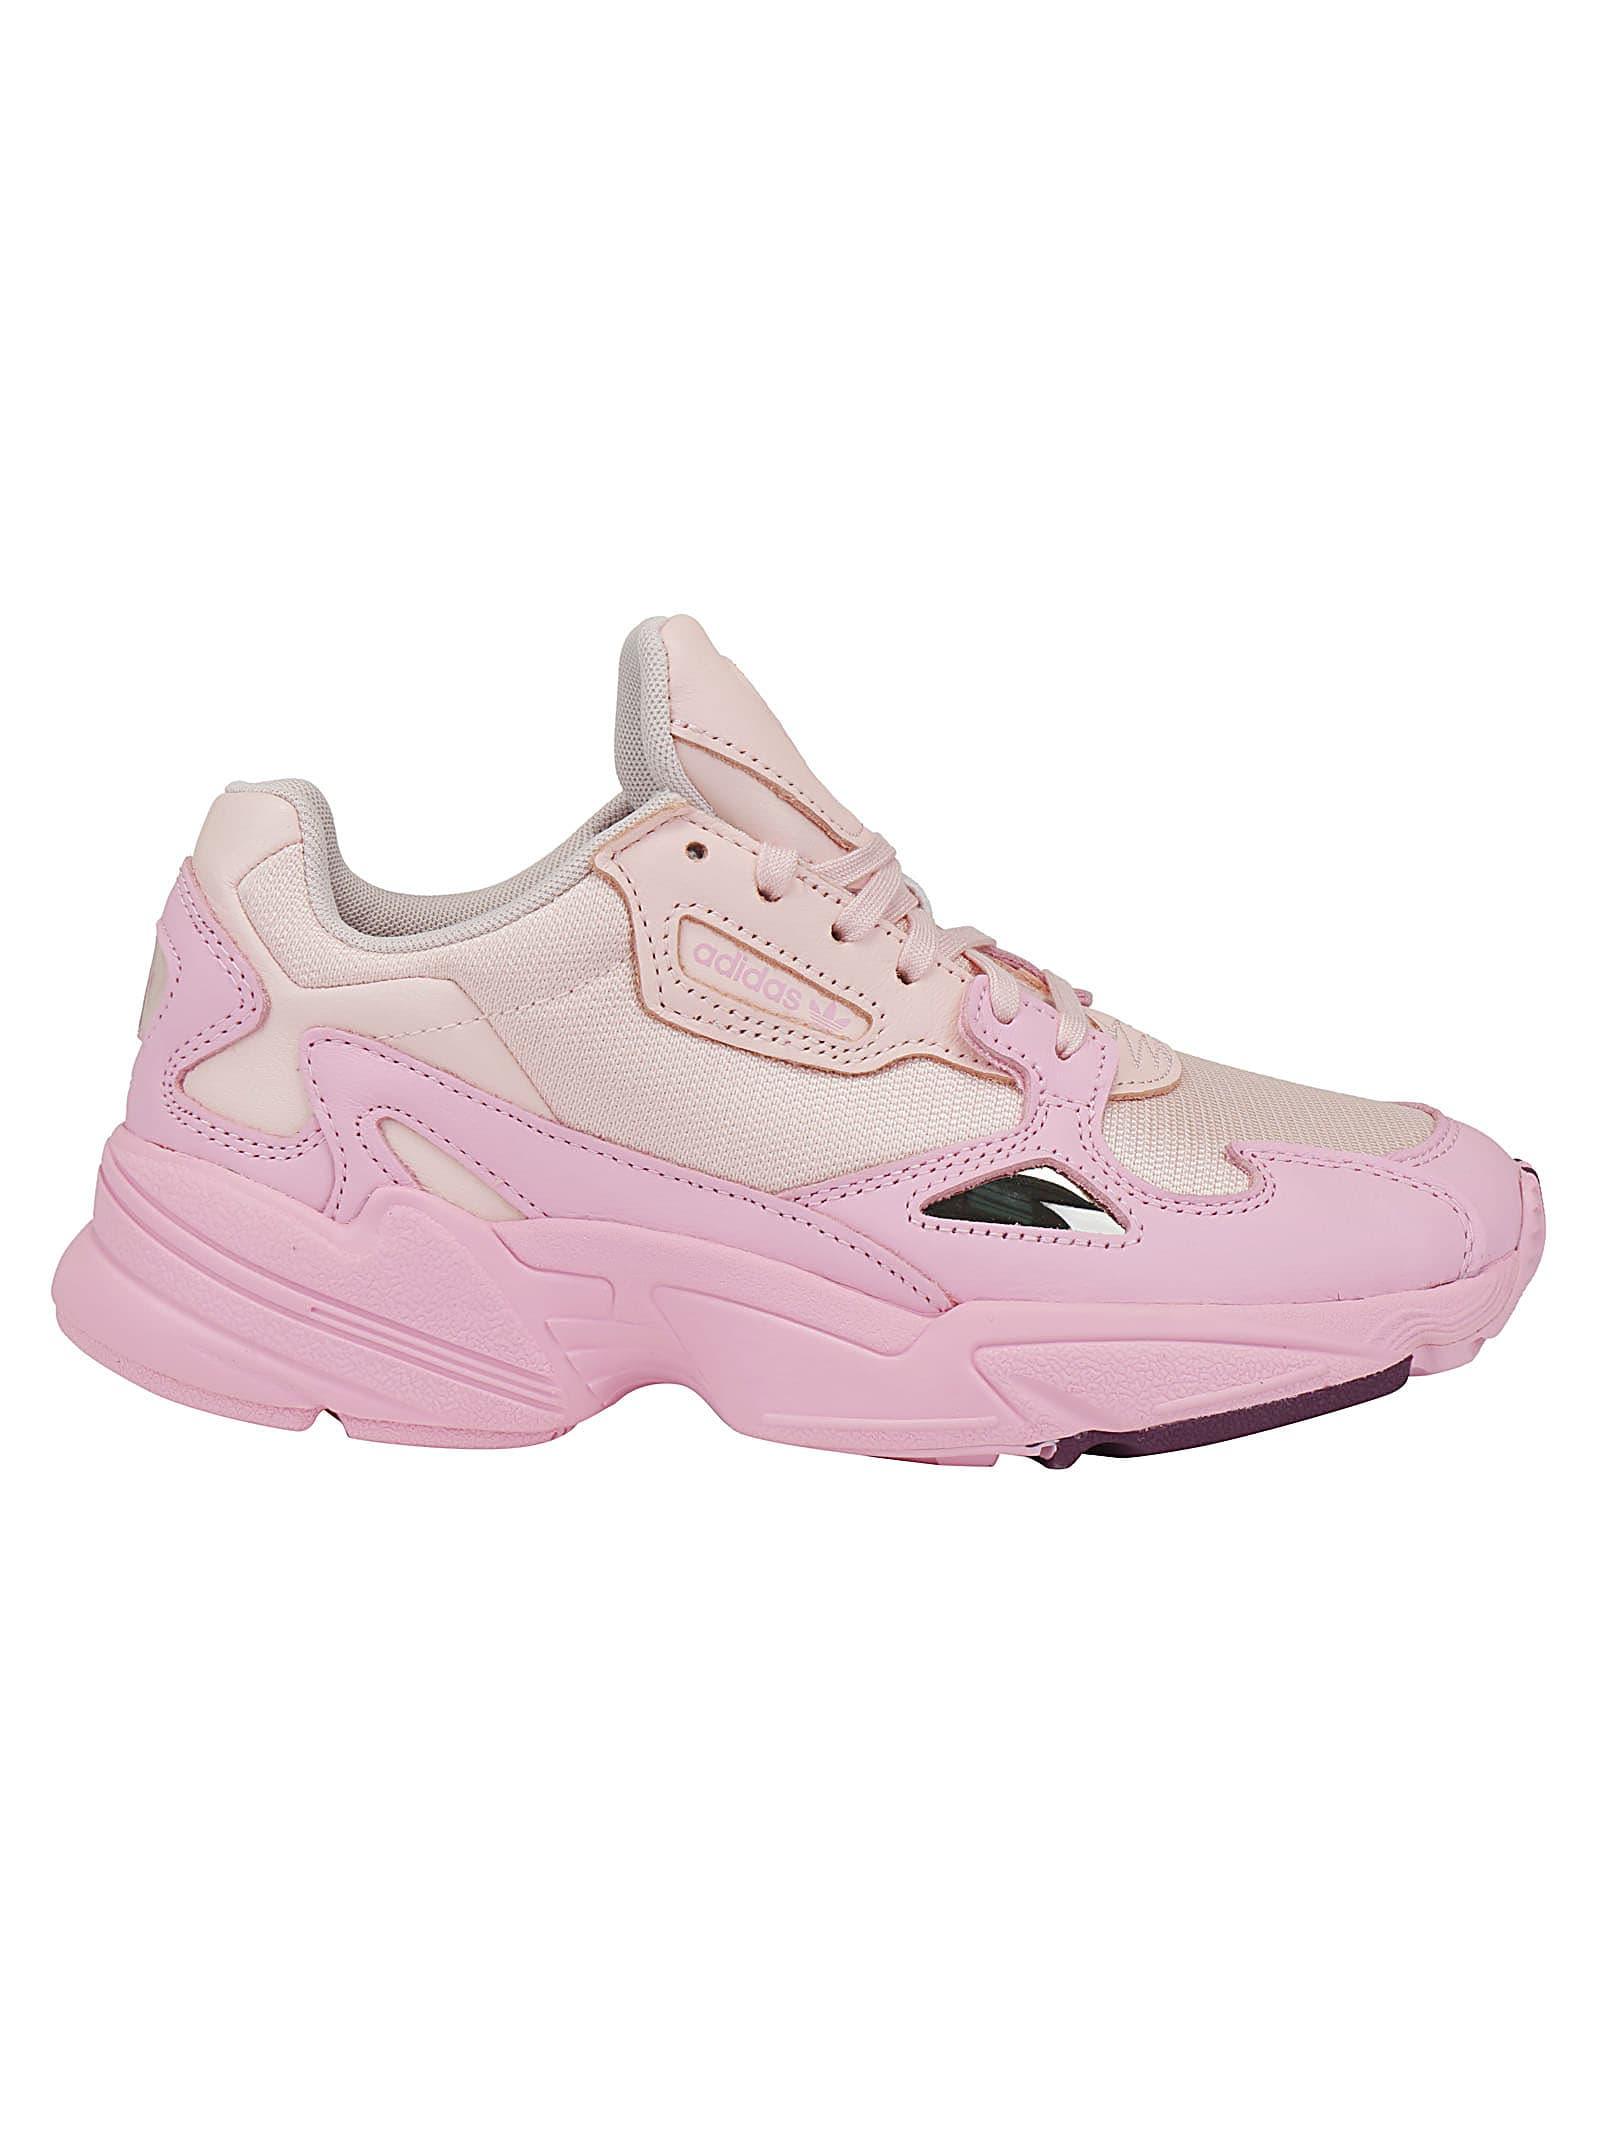 Adidas Falcon Sneakers